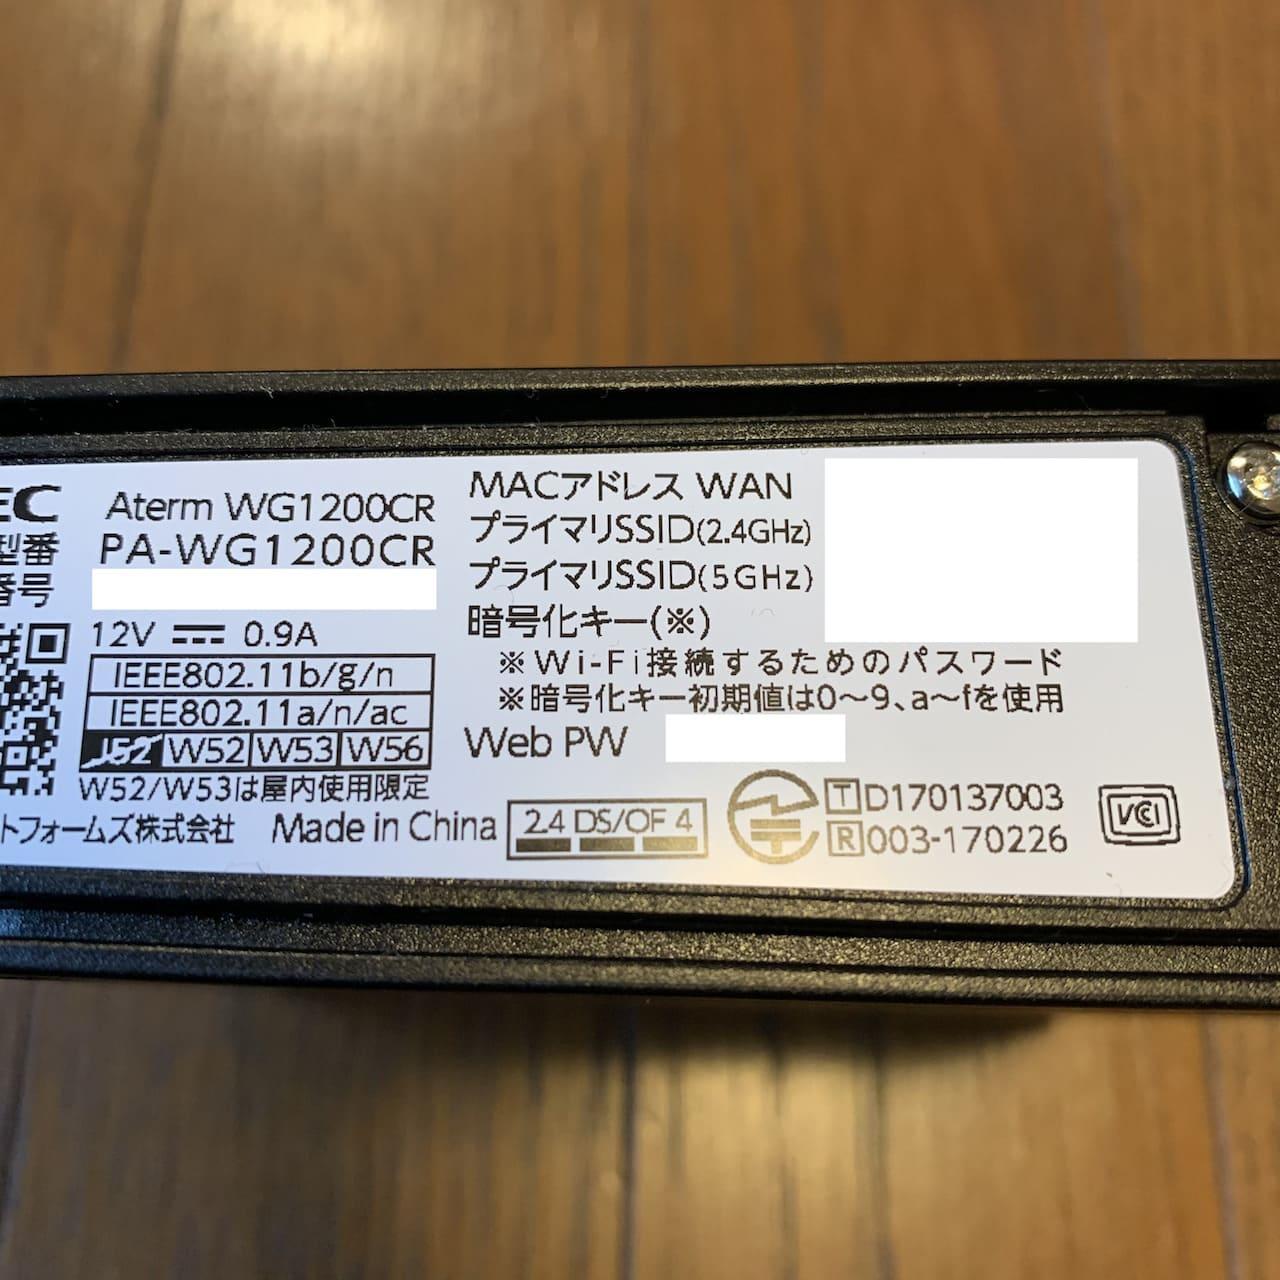 Aterm WG1200CR(PA-WG1200CR)のSSIDと暗号化キー(パスワード)